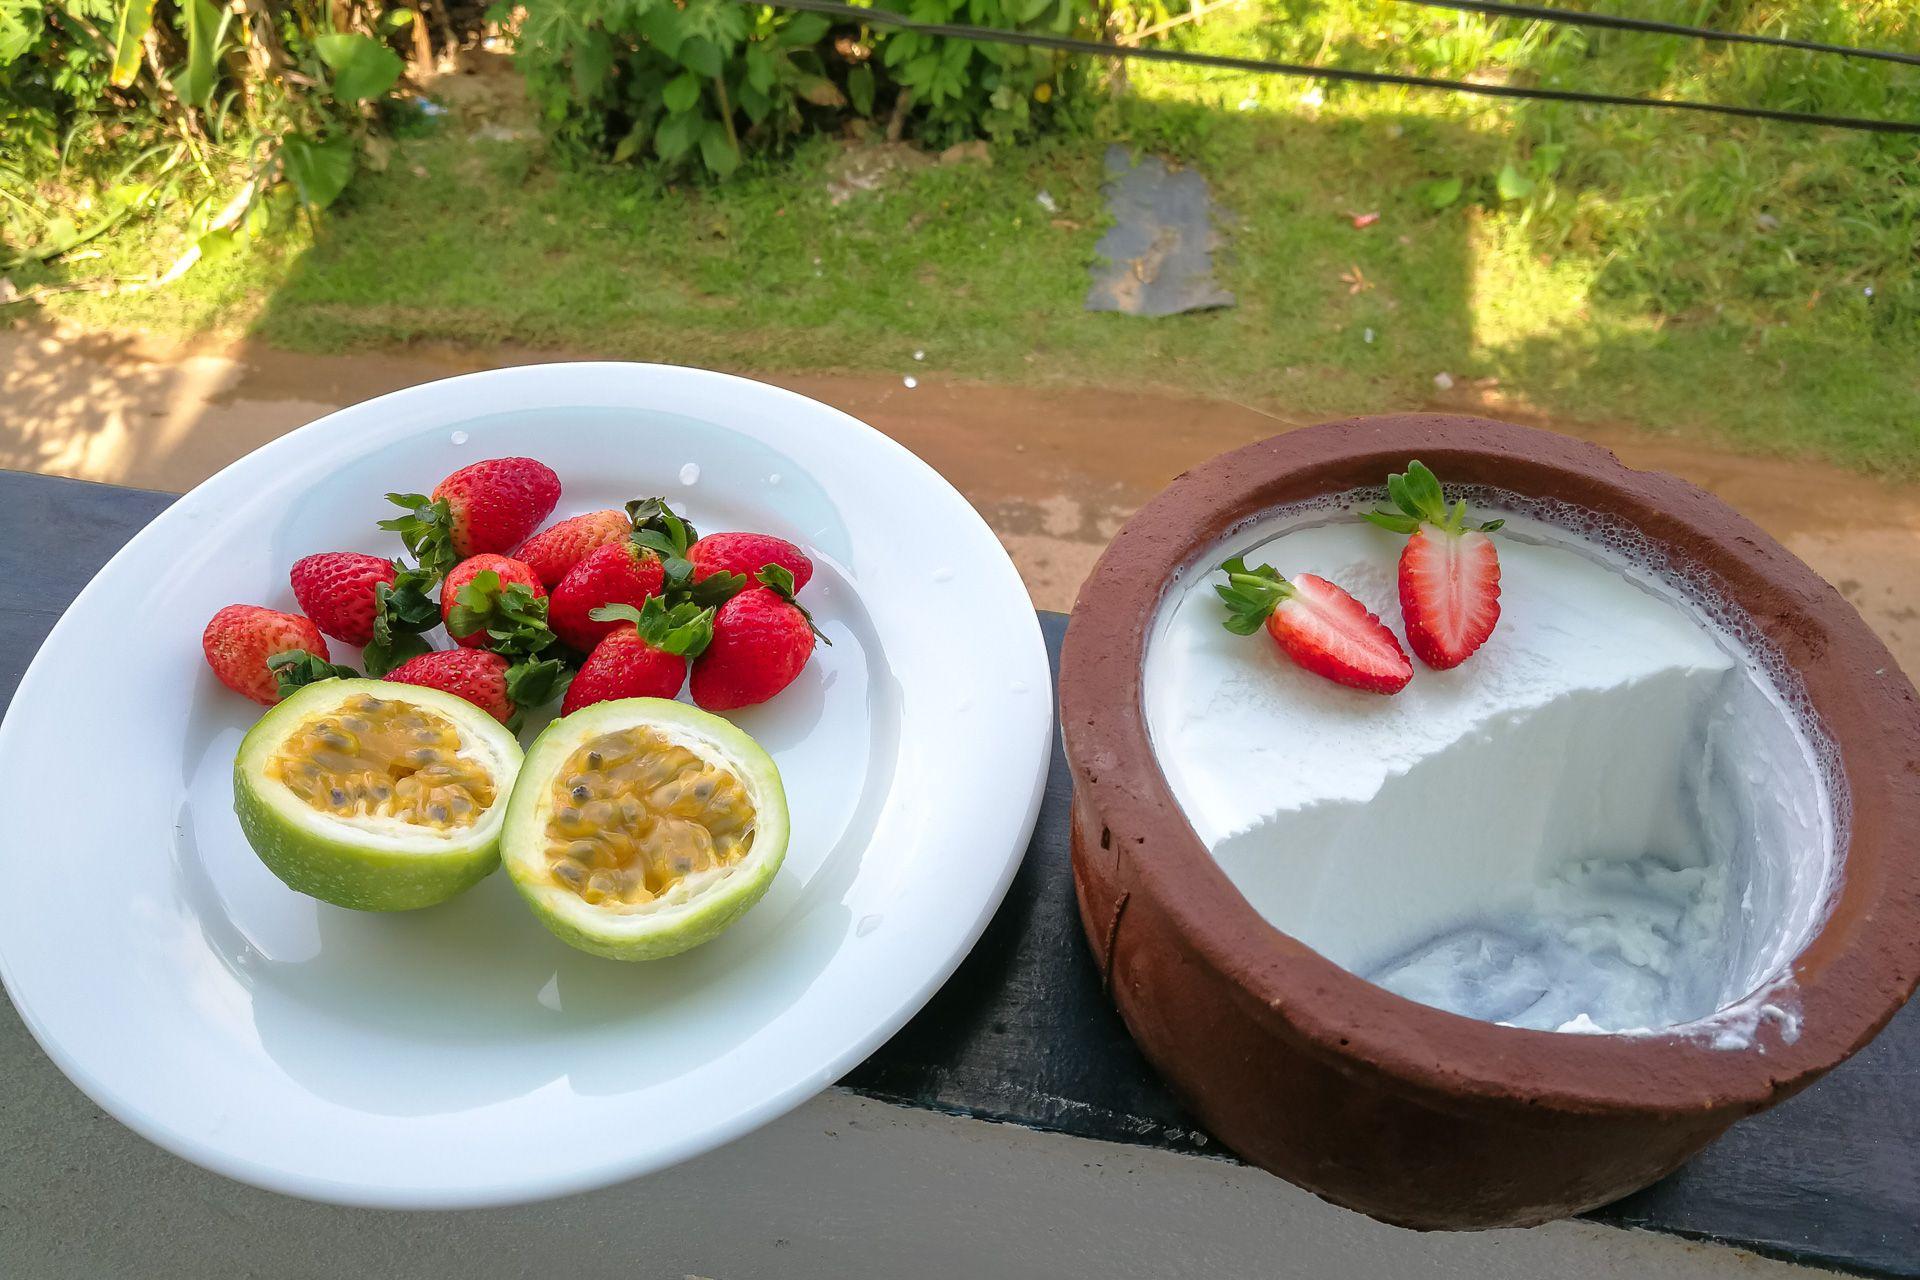 Srilanka food, Шри-Ланка, еда Шри-Ланка, что едят на Шри-Ланке, что попробовать на Шри-Ланке, кухня Шри-Ланки, фрукты Шри-Ланка, желтый кокос, королевский кокос, котту, хопэс, хопес, курд, кёрд, красный банан, Унаватуна еда